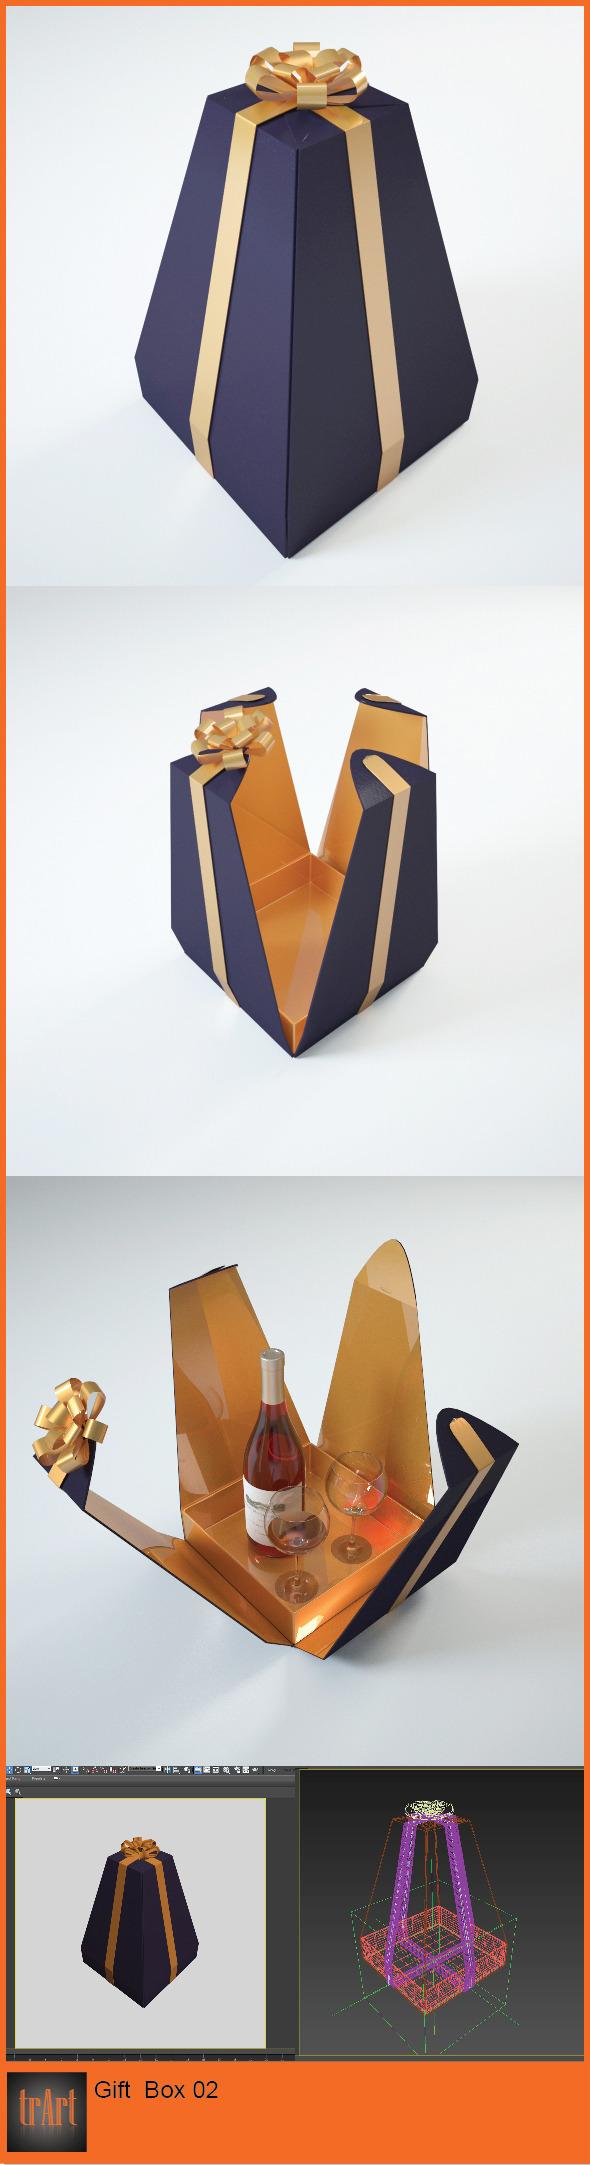 3DOcean Gift Box 6295177